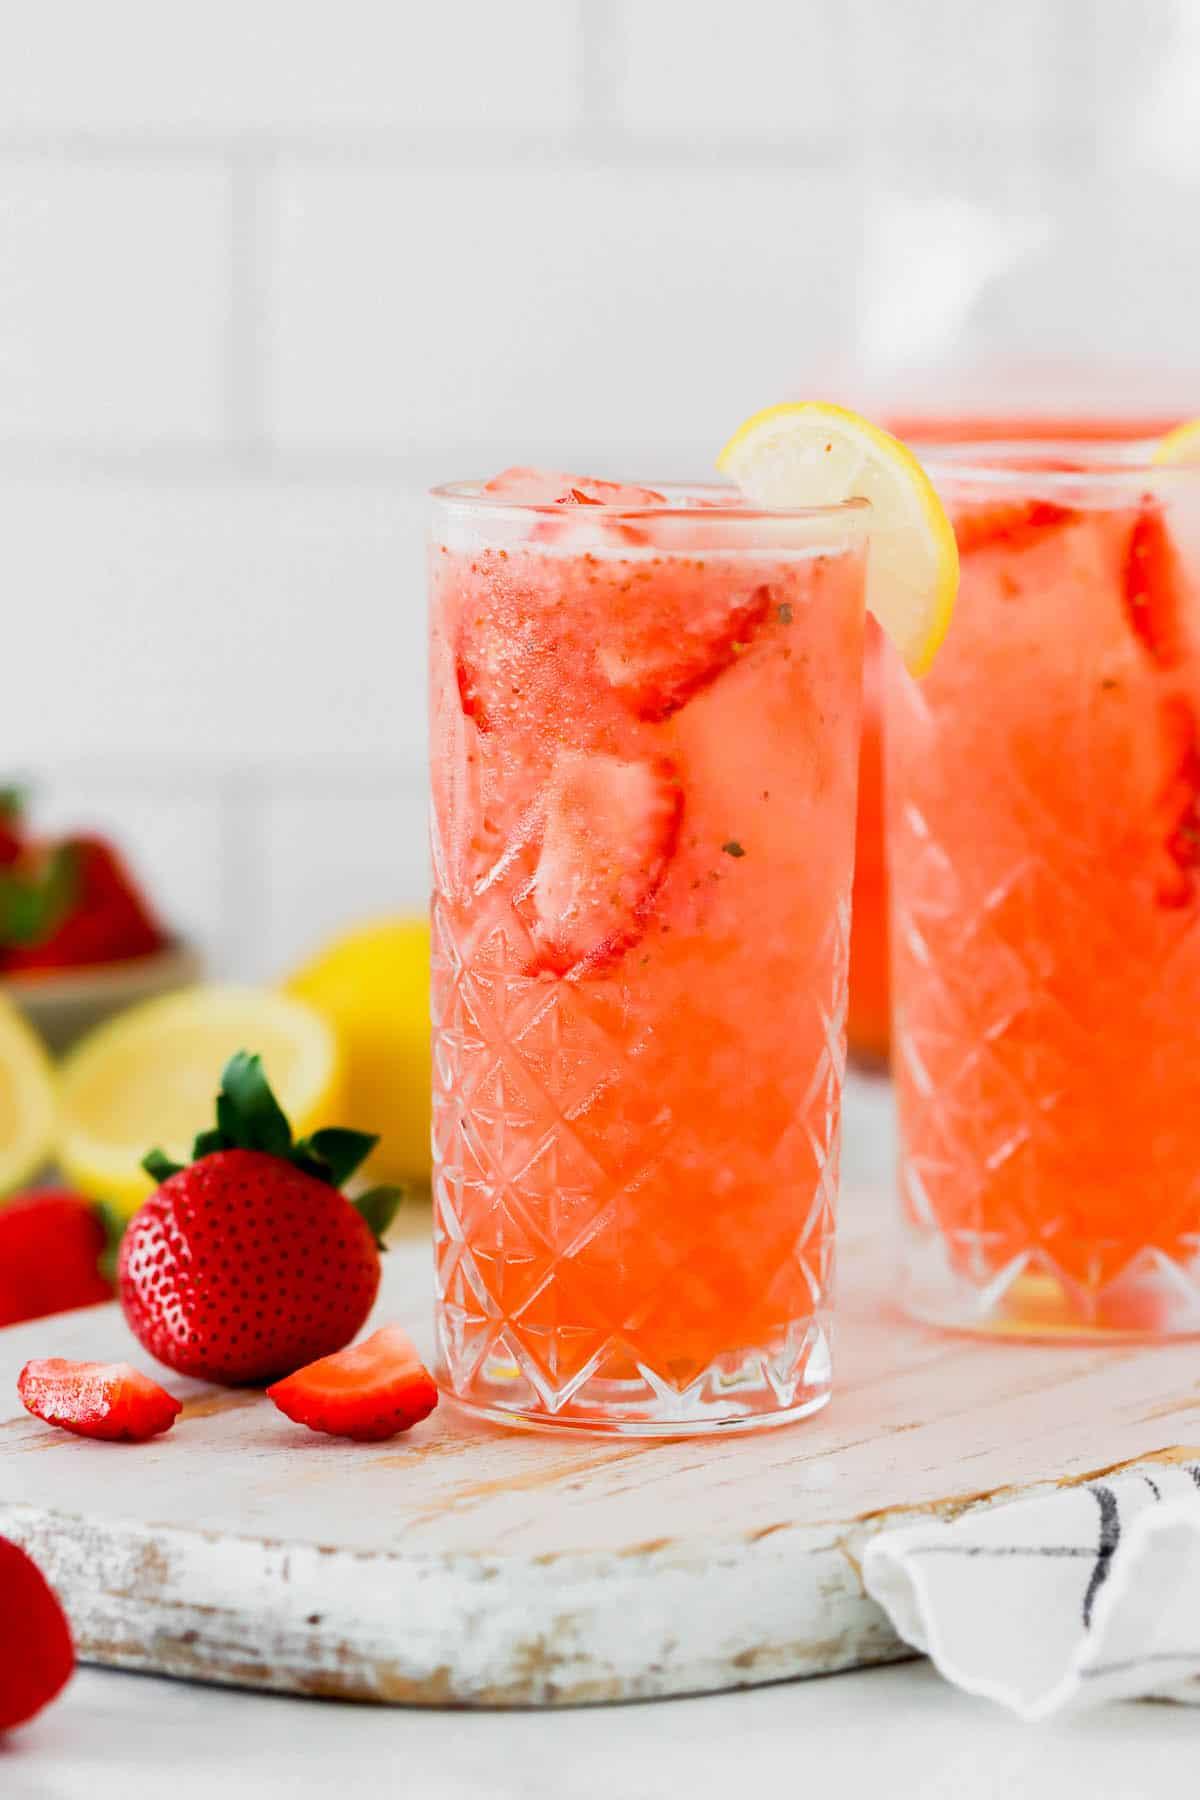 Two glasses of homemade lemonade with strawberries